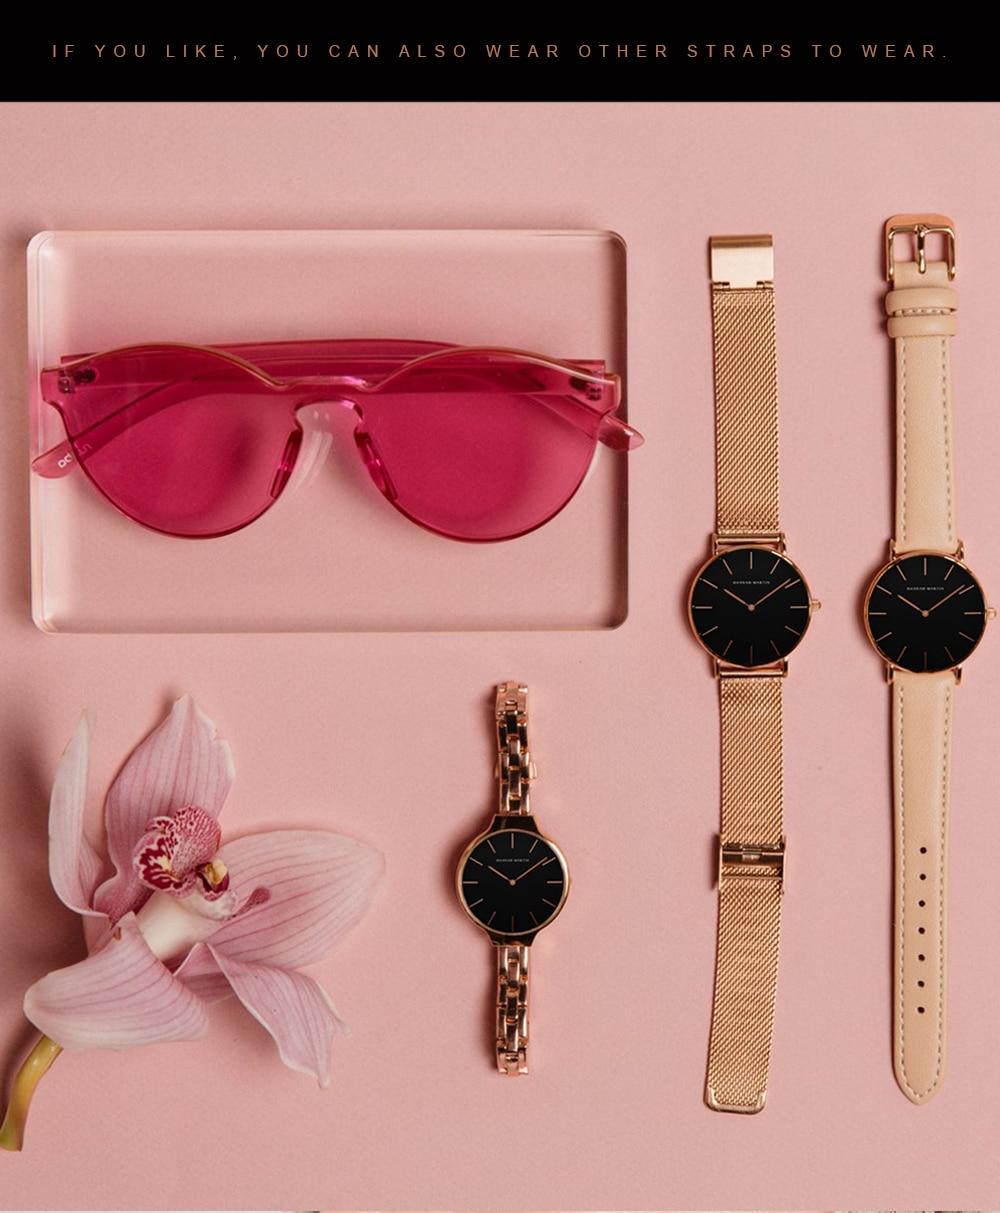 Trendy Watch for Women Fashion Accessory